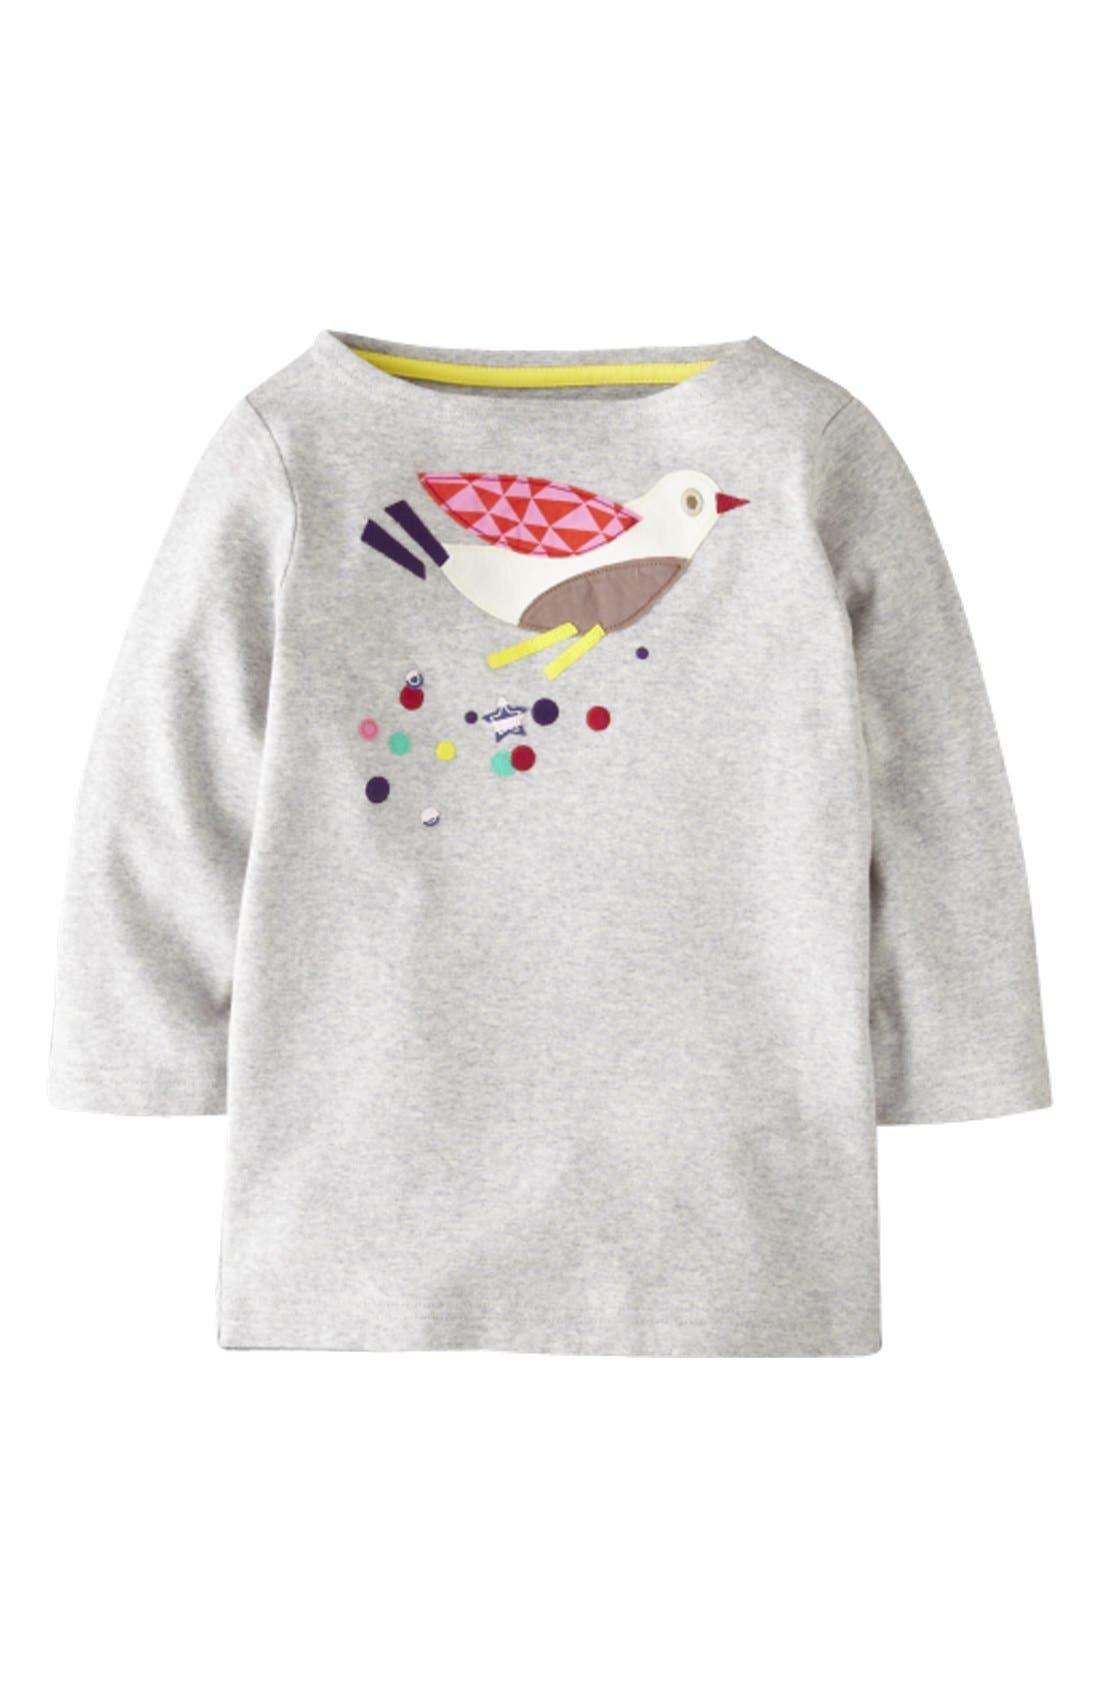 Main Image - Mini Boden 'Kaleidoscope Appliqué' Tee (Little Girls & Big Girls)